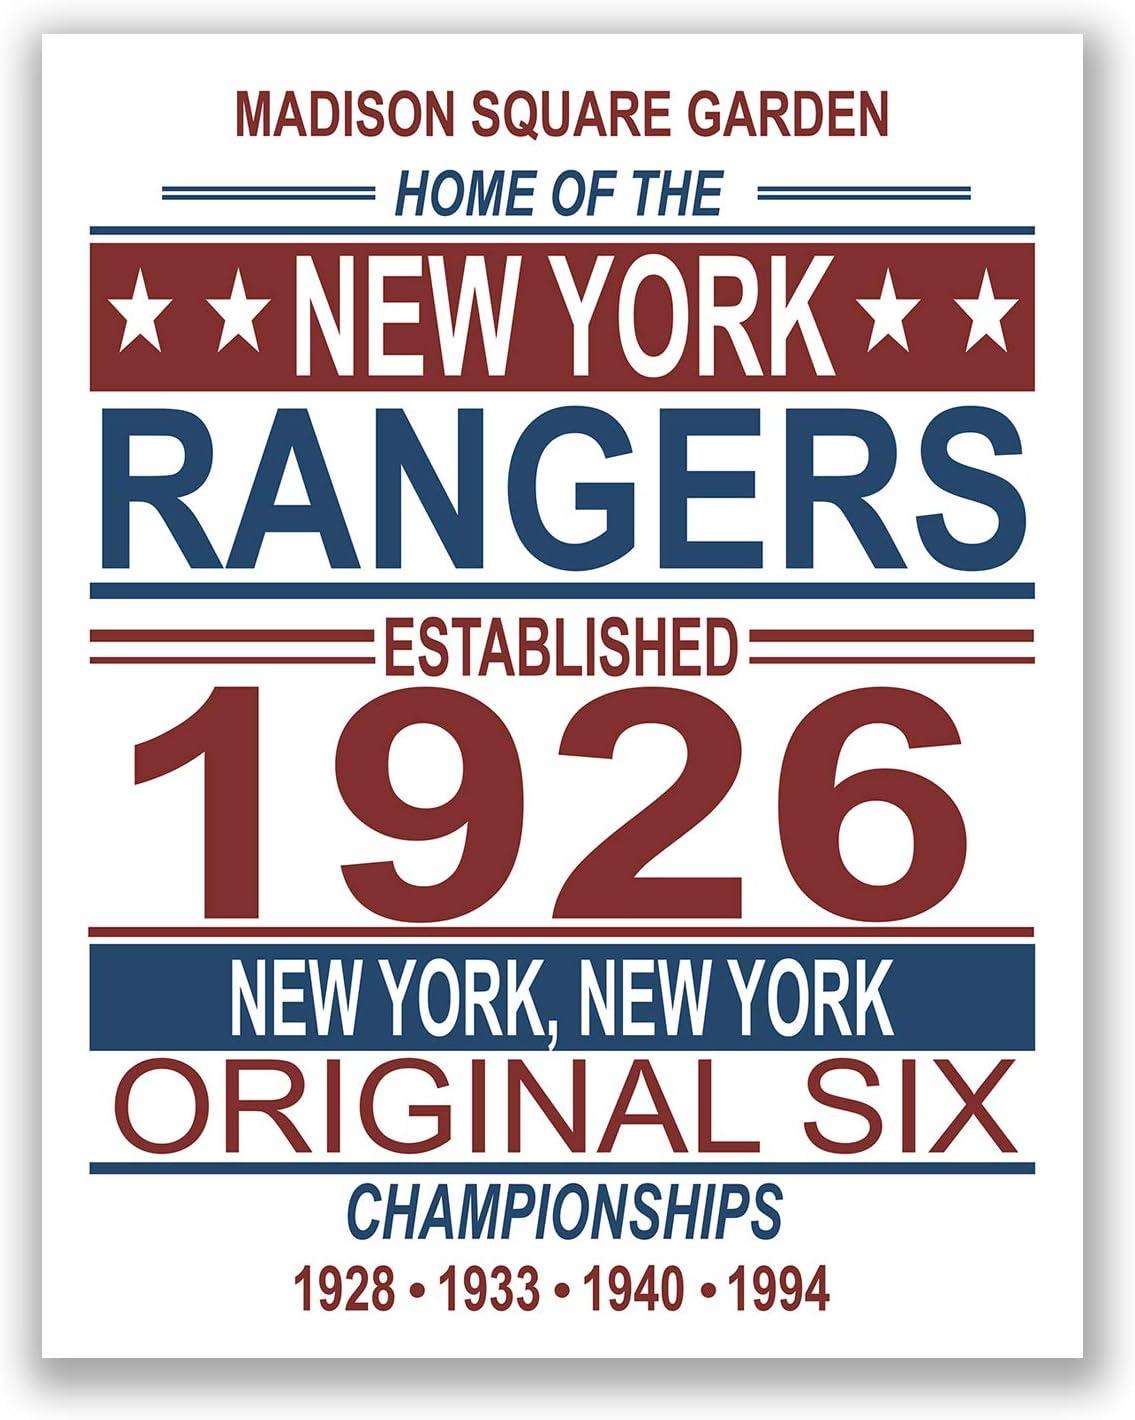 New York Rangers NHL Poster - Vintage Championship Team - 11x14 Matte Poster Print